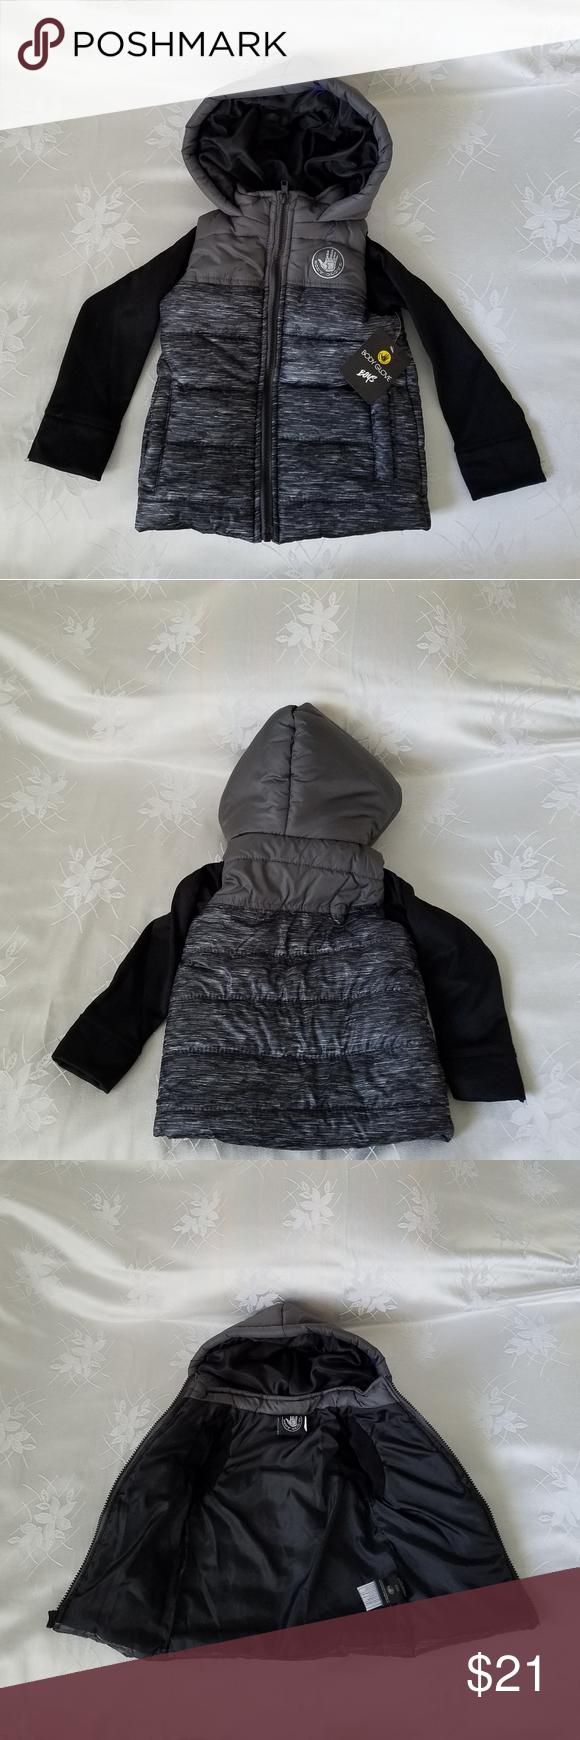 Body Glove Toddler Boy Hooded Puffer Jacket Warm Toddler Boy Puffer Jacket With Hood Zip Closure And 2 Pockets T Body Glove Boys Puffer Jacket Puffer Jackets [ 1740 x 580 Pixel ]